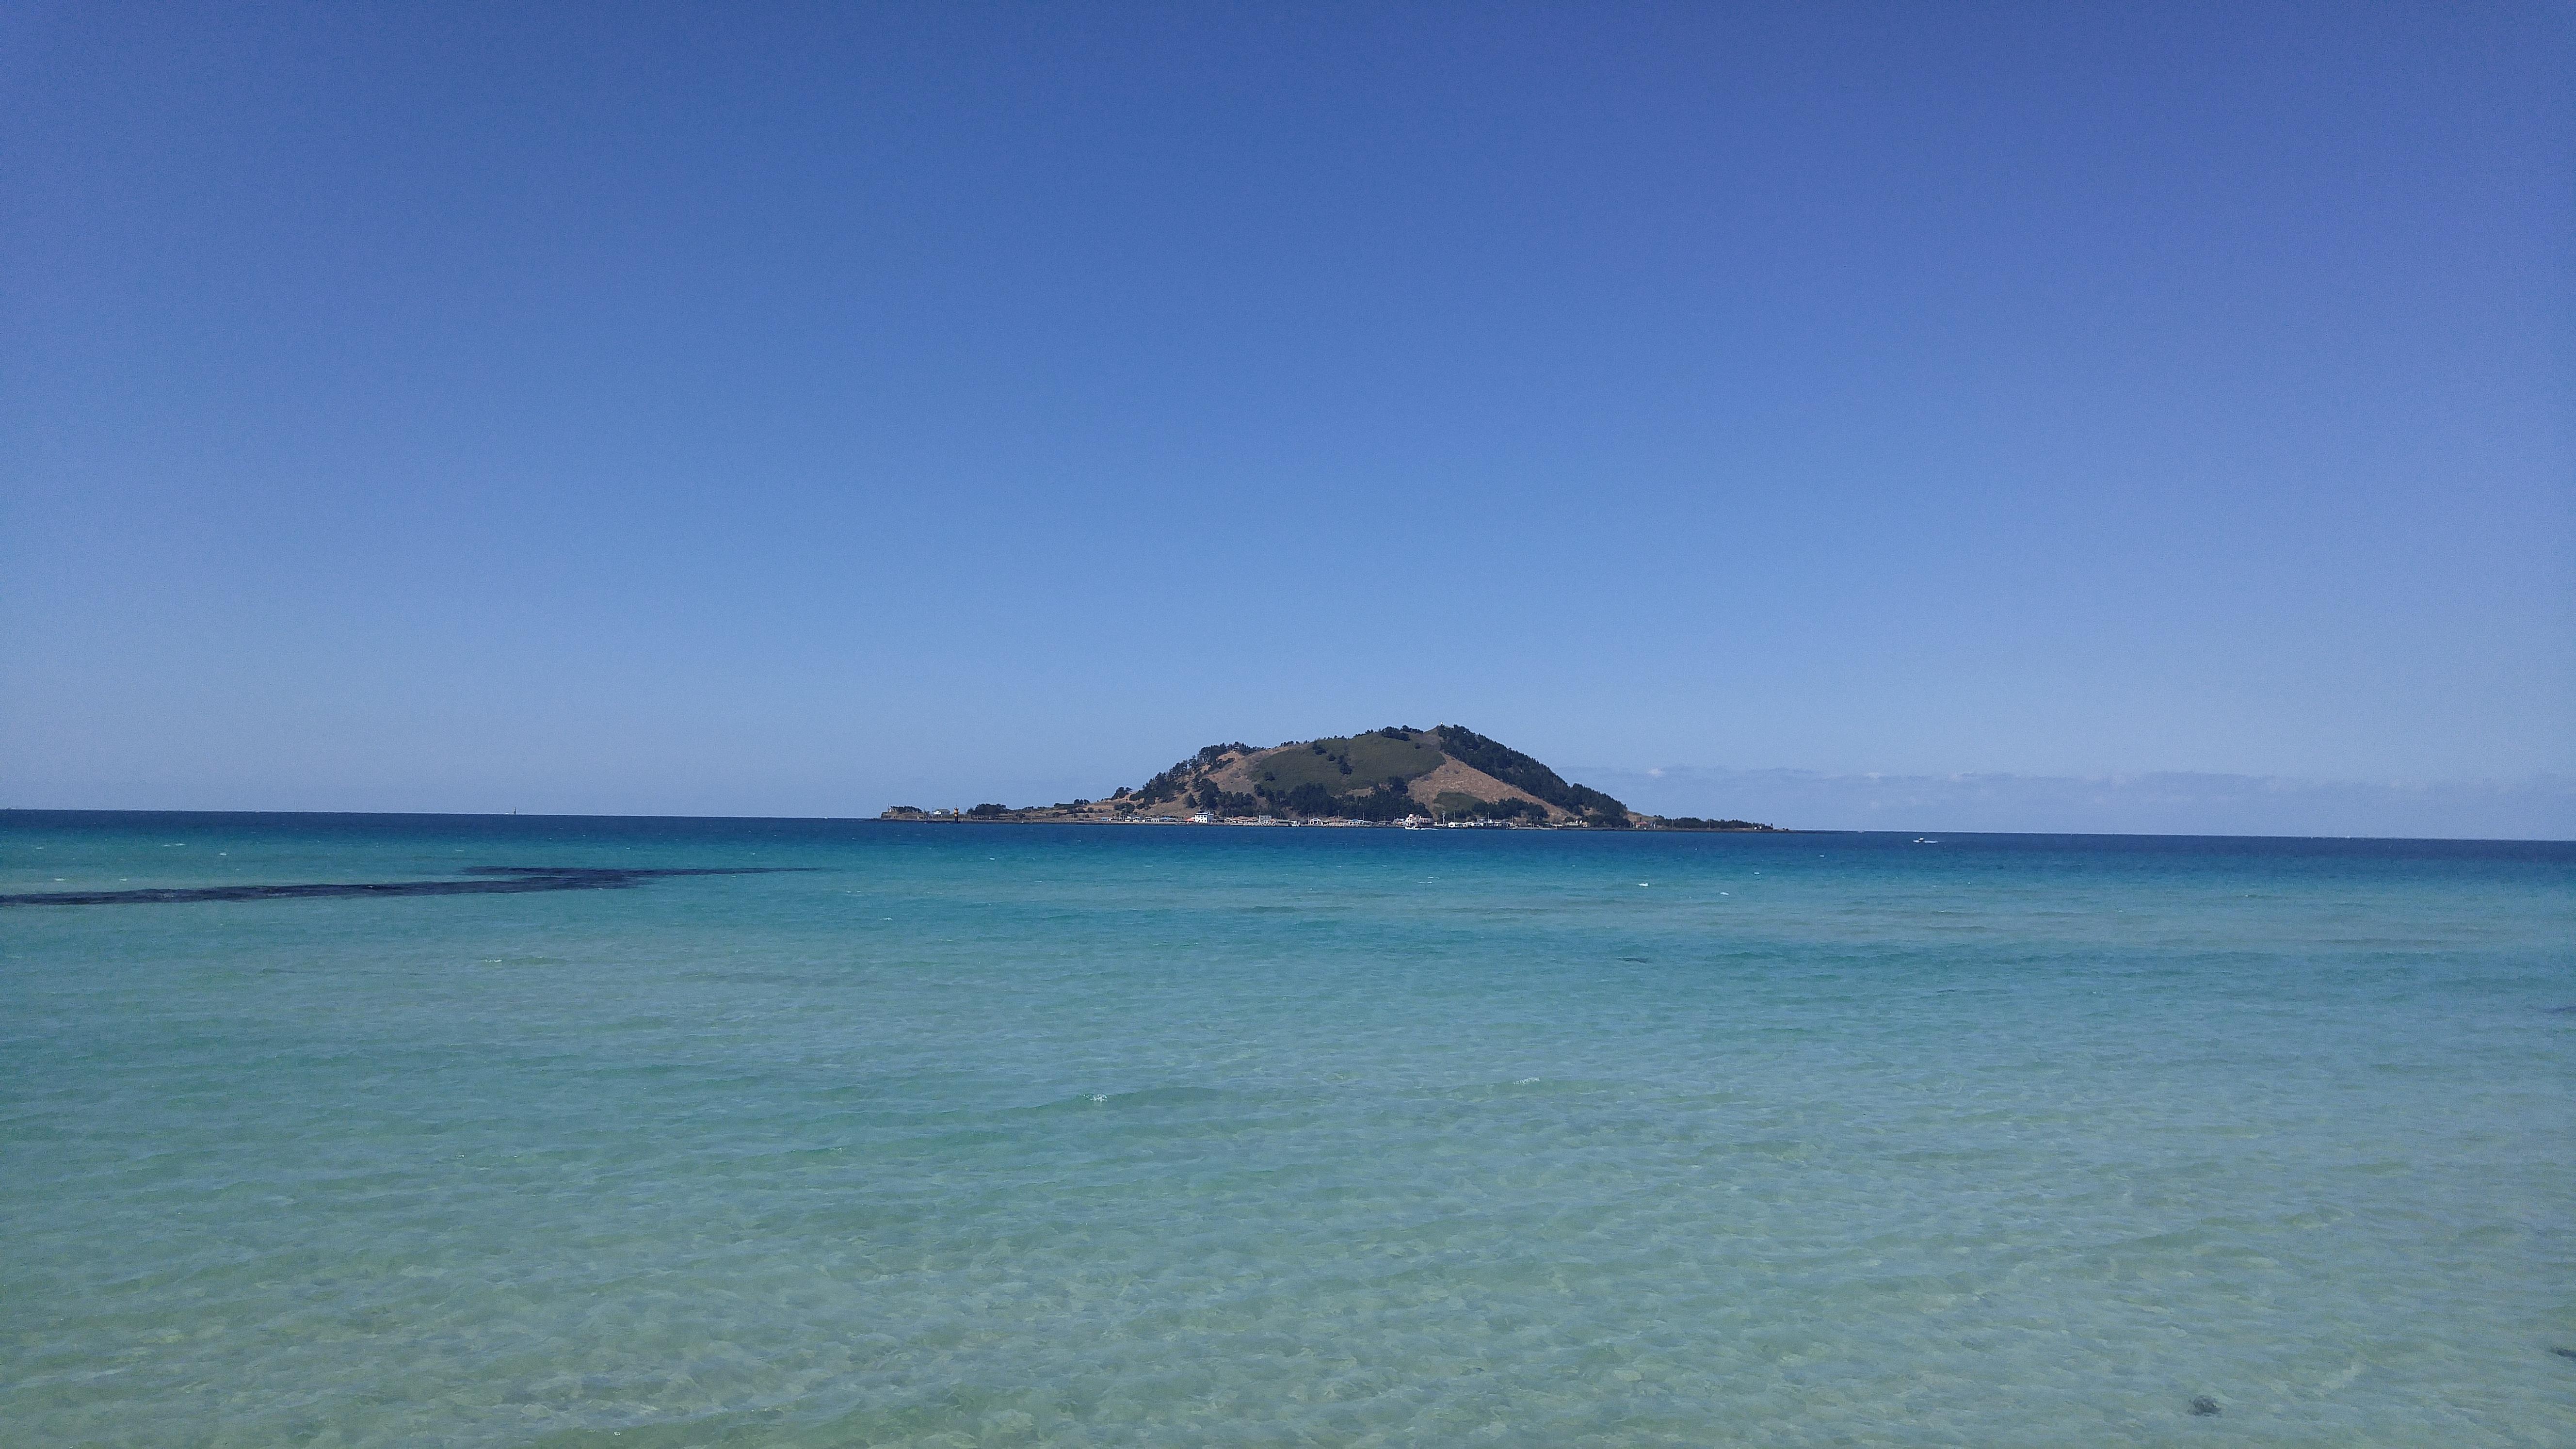 Free Images : beach, coast, sand, ocean, horizon, shore